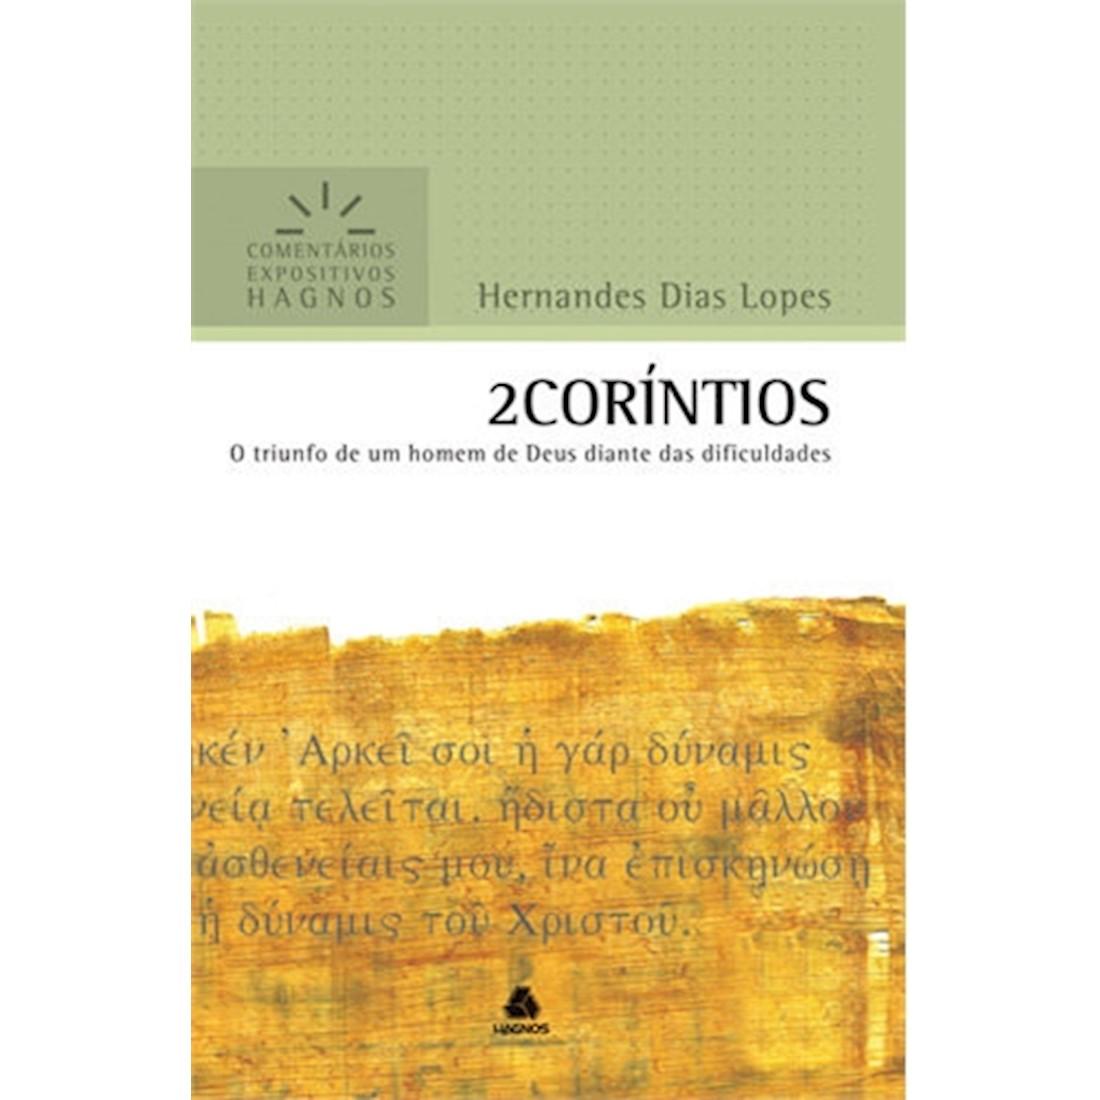 Livro 2 Coríntios | Comentários Expositivos Hagnos